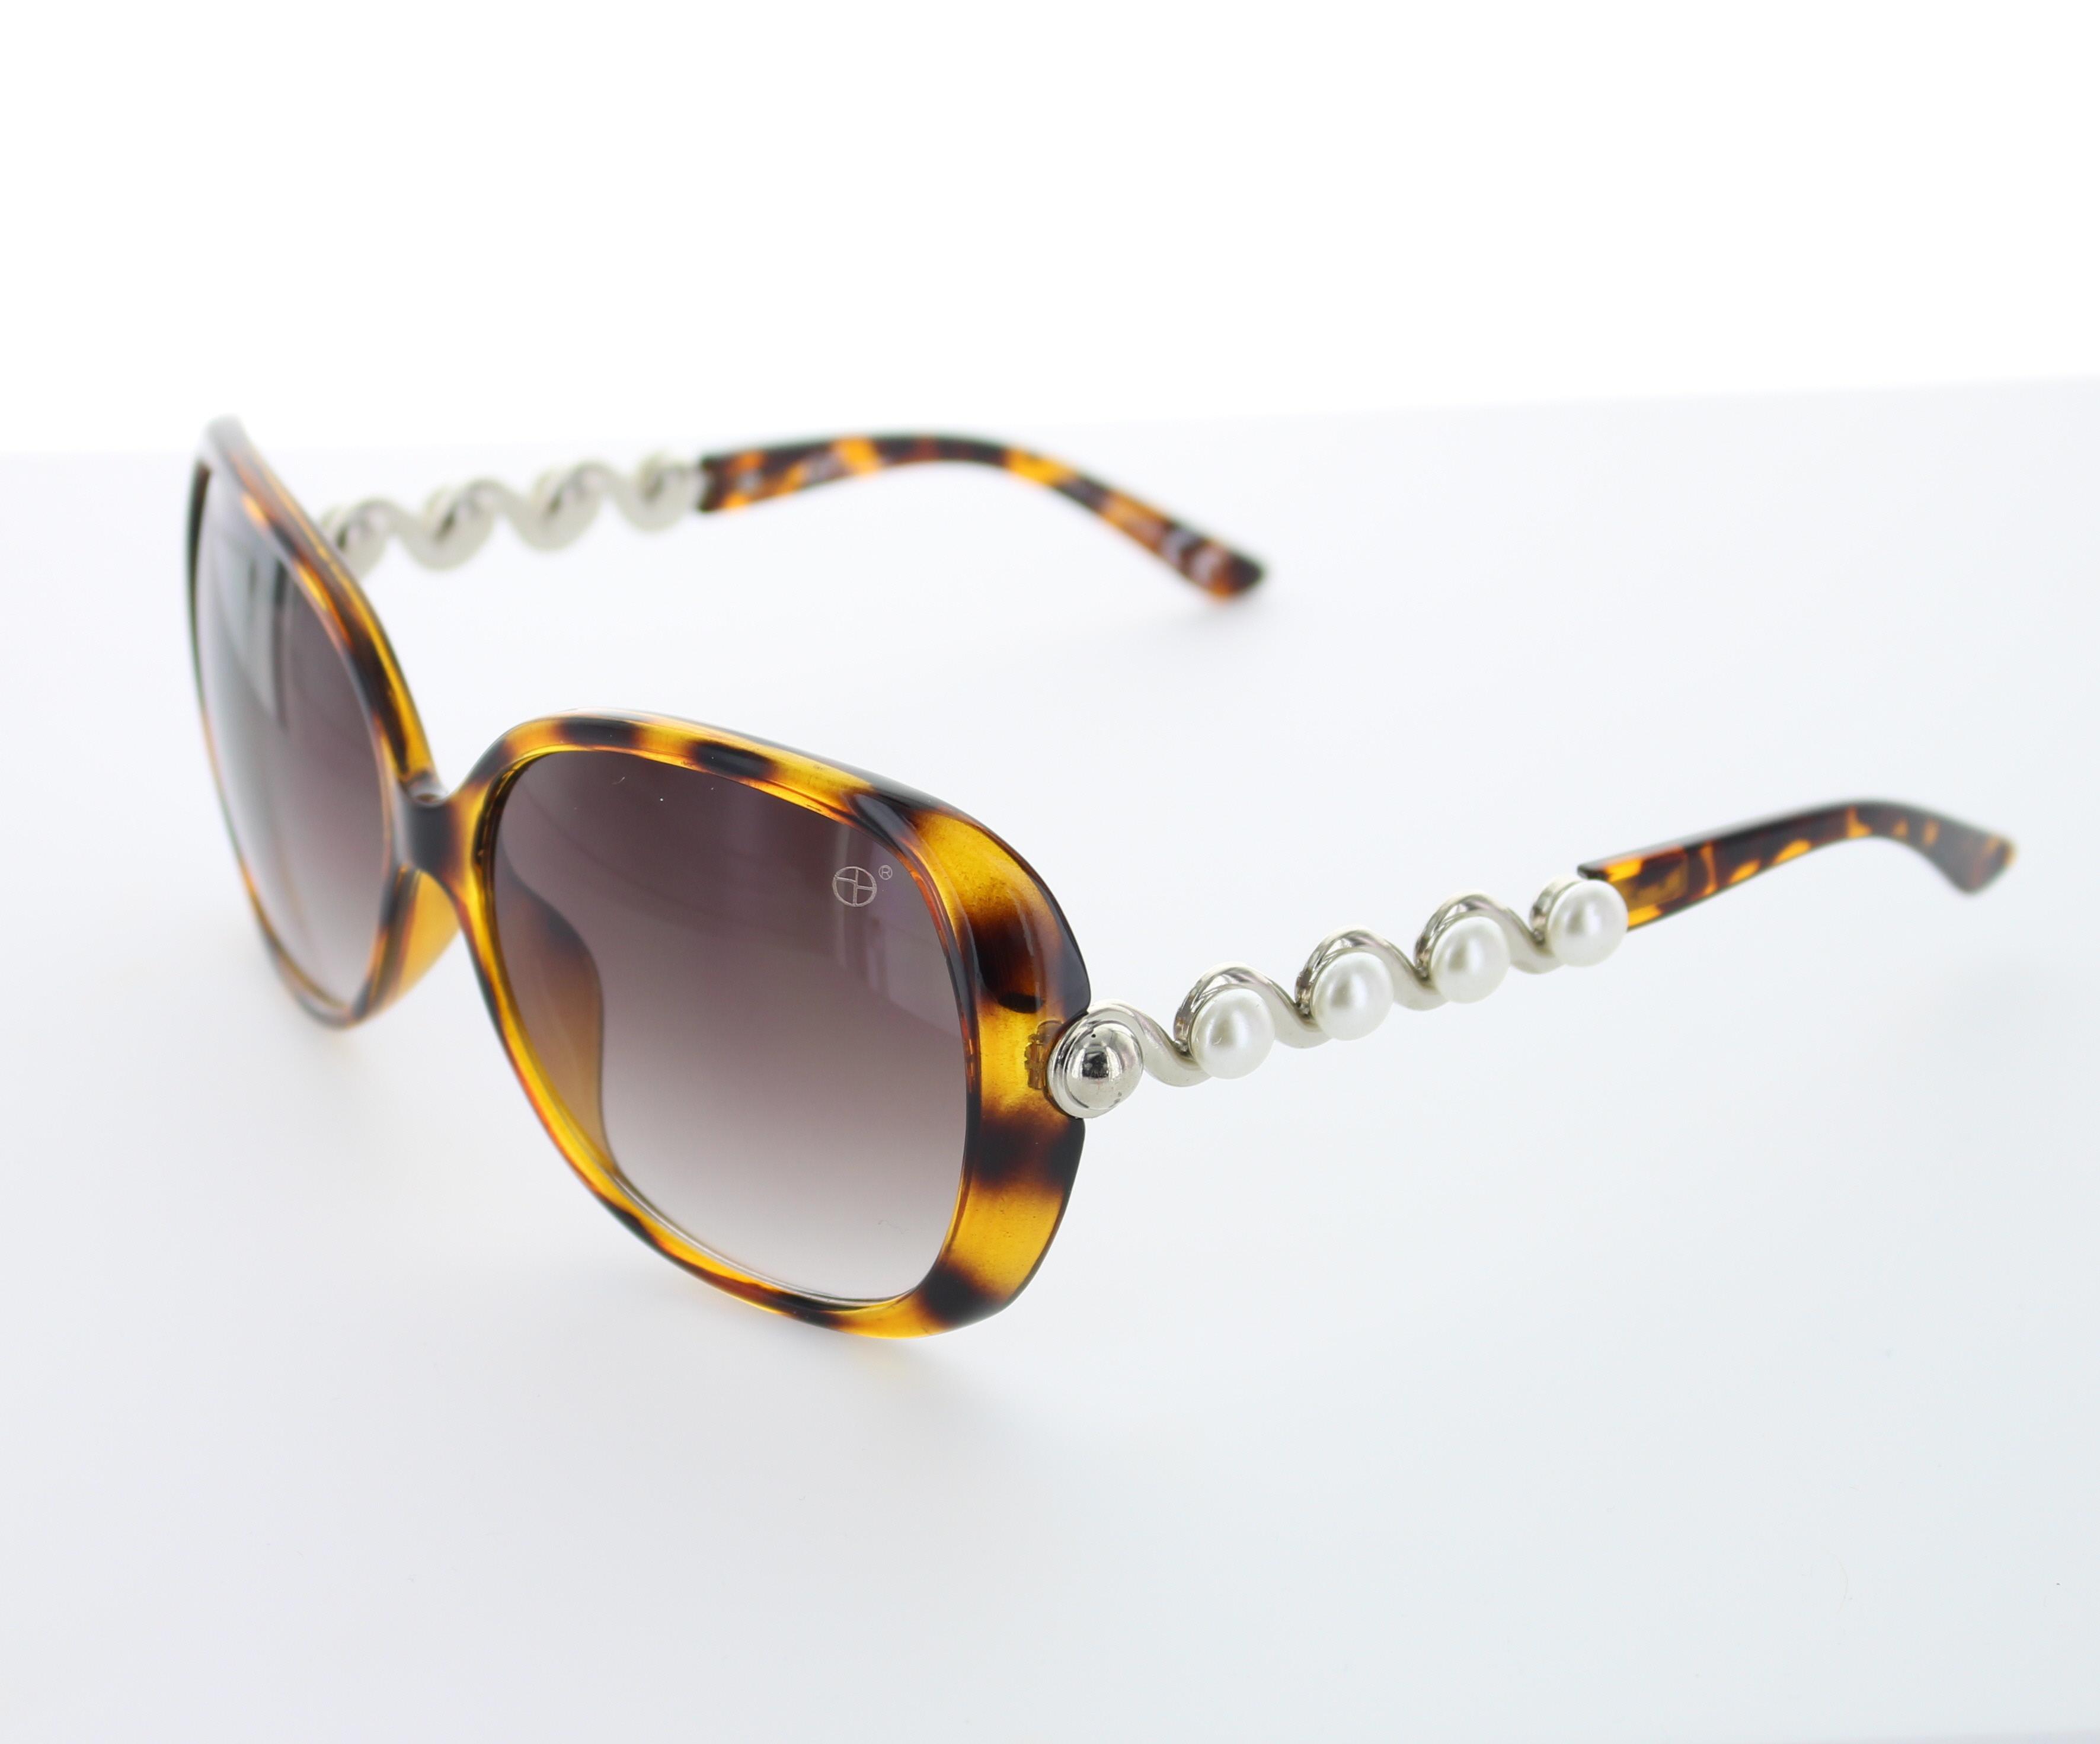 Oleg cassini fashion sunglasses 100